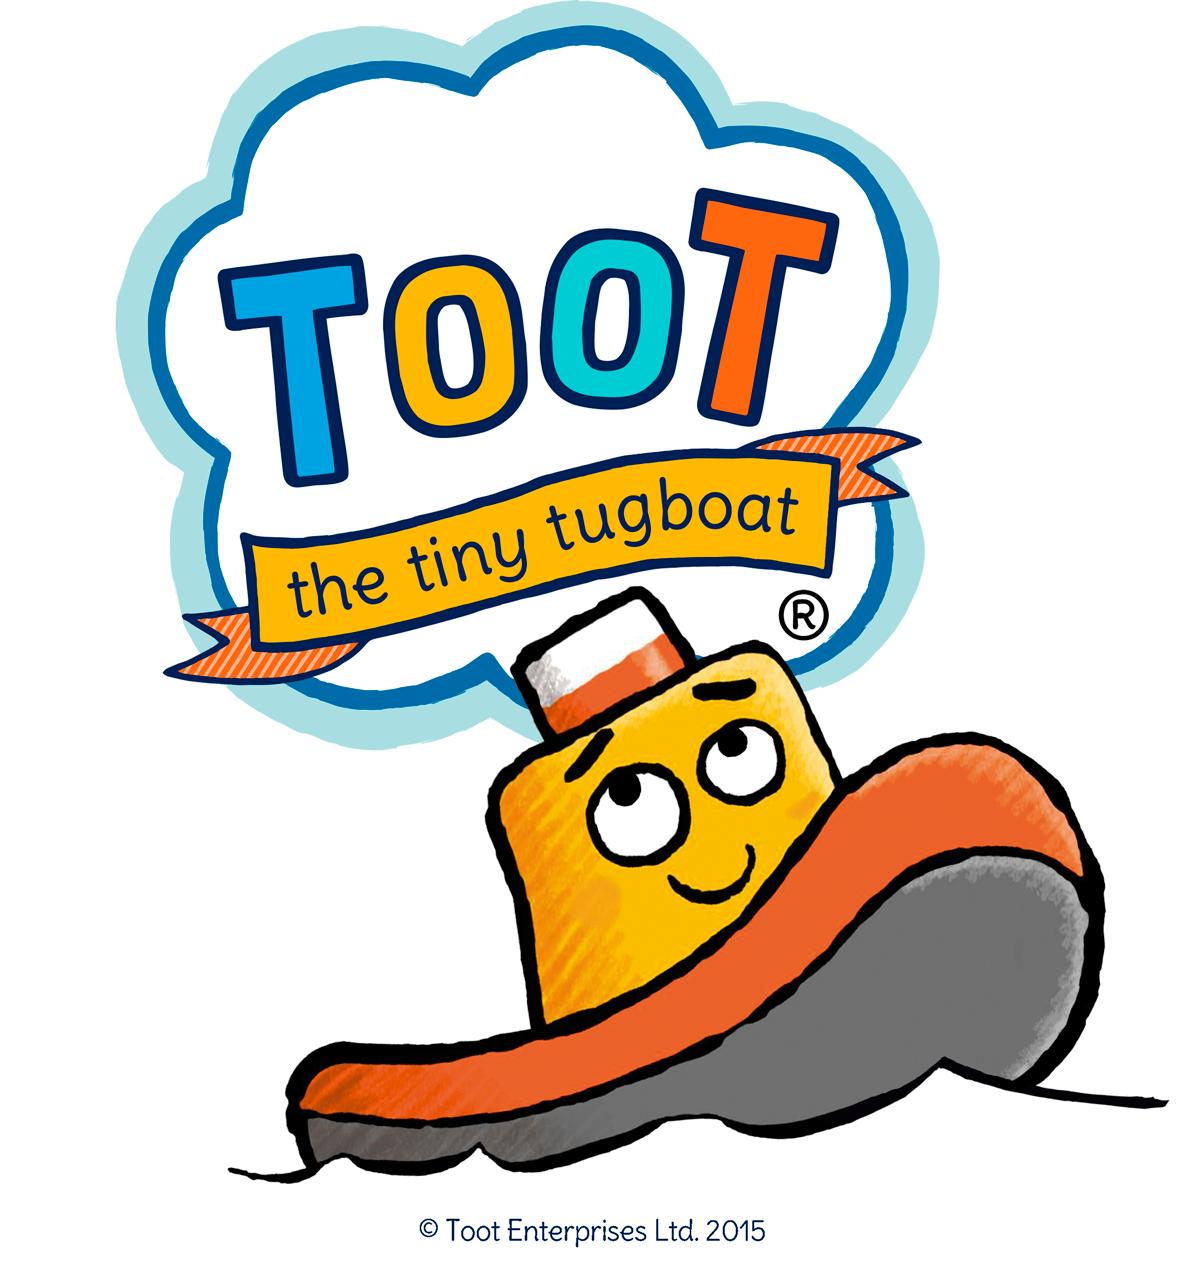 Tugboat clipart cartoon Toot  Tugboat the Tiny